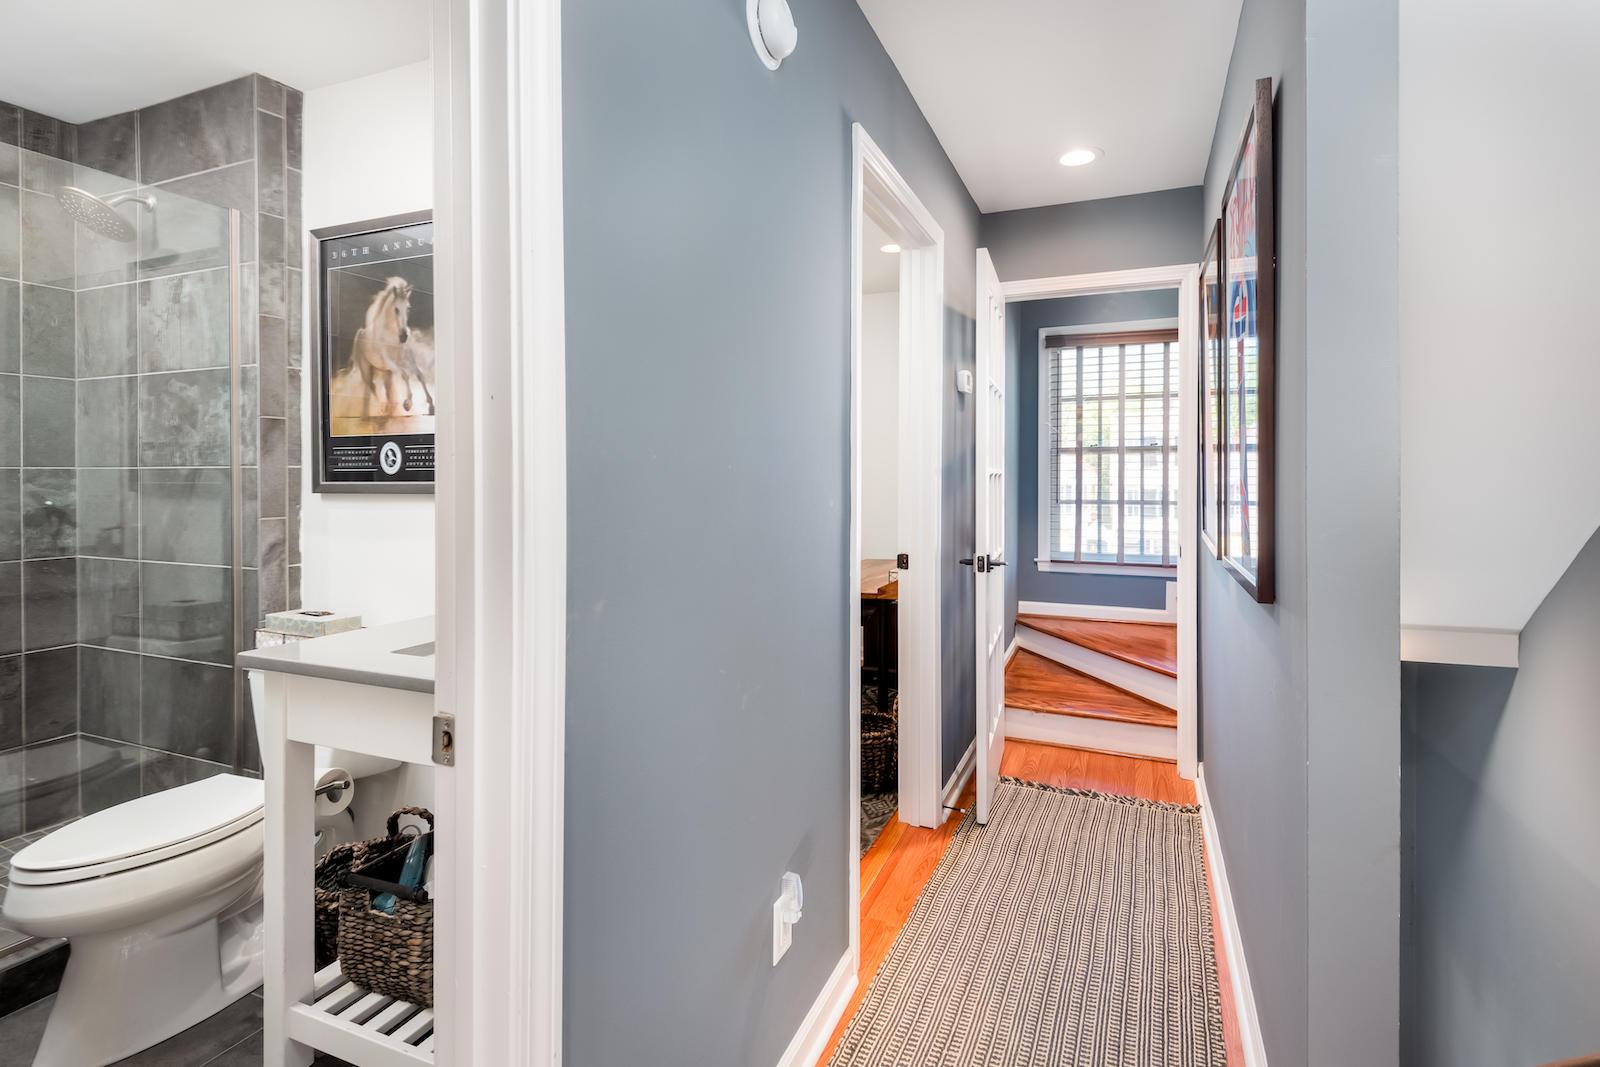 Harleston Village Homes For Sale - 15 Horlbeck, Charleston, SC - 22